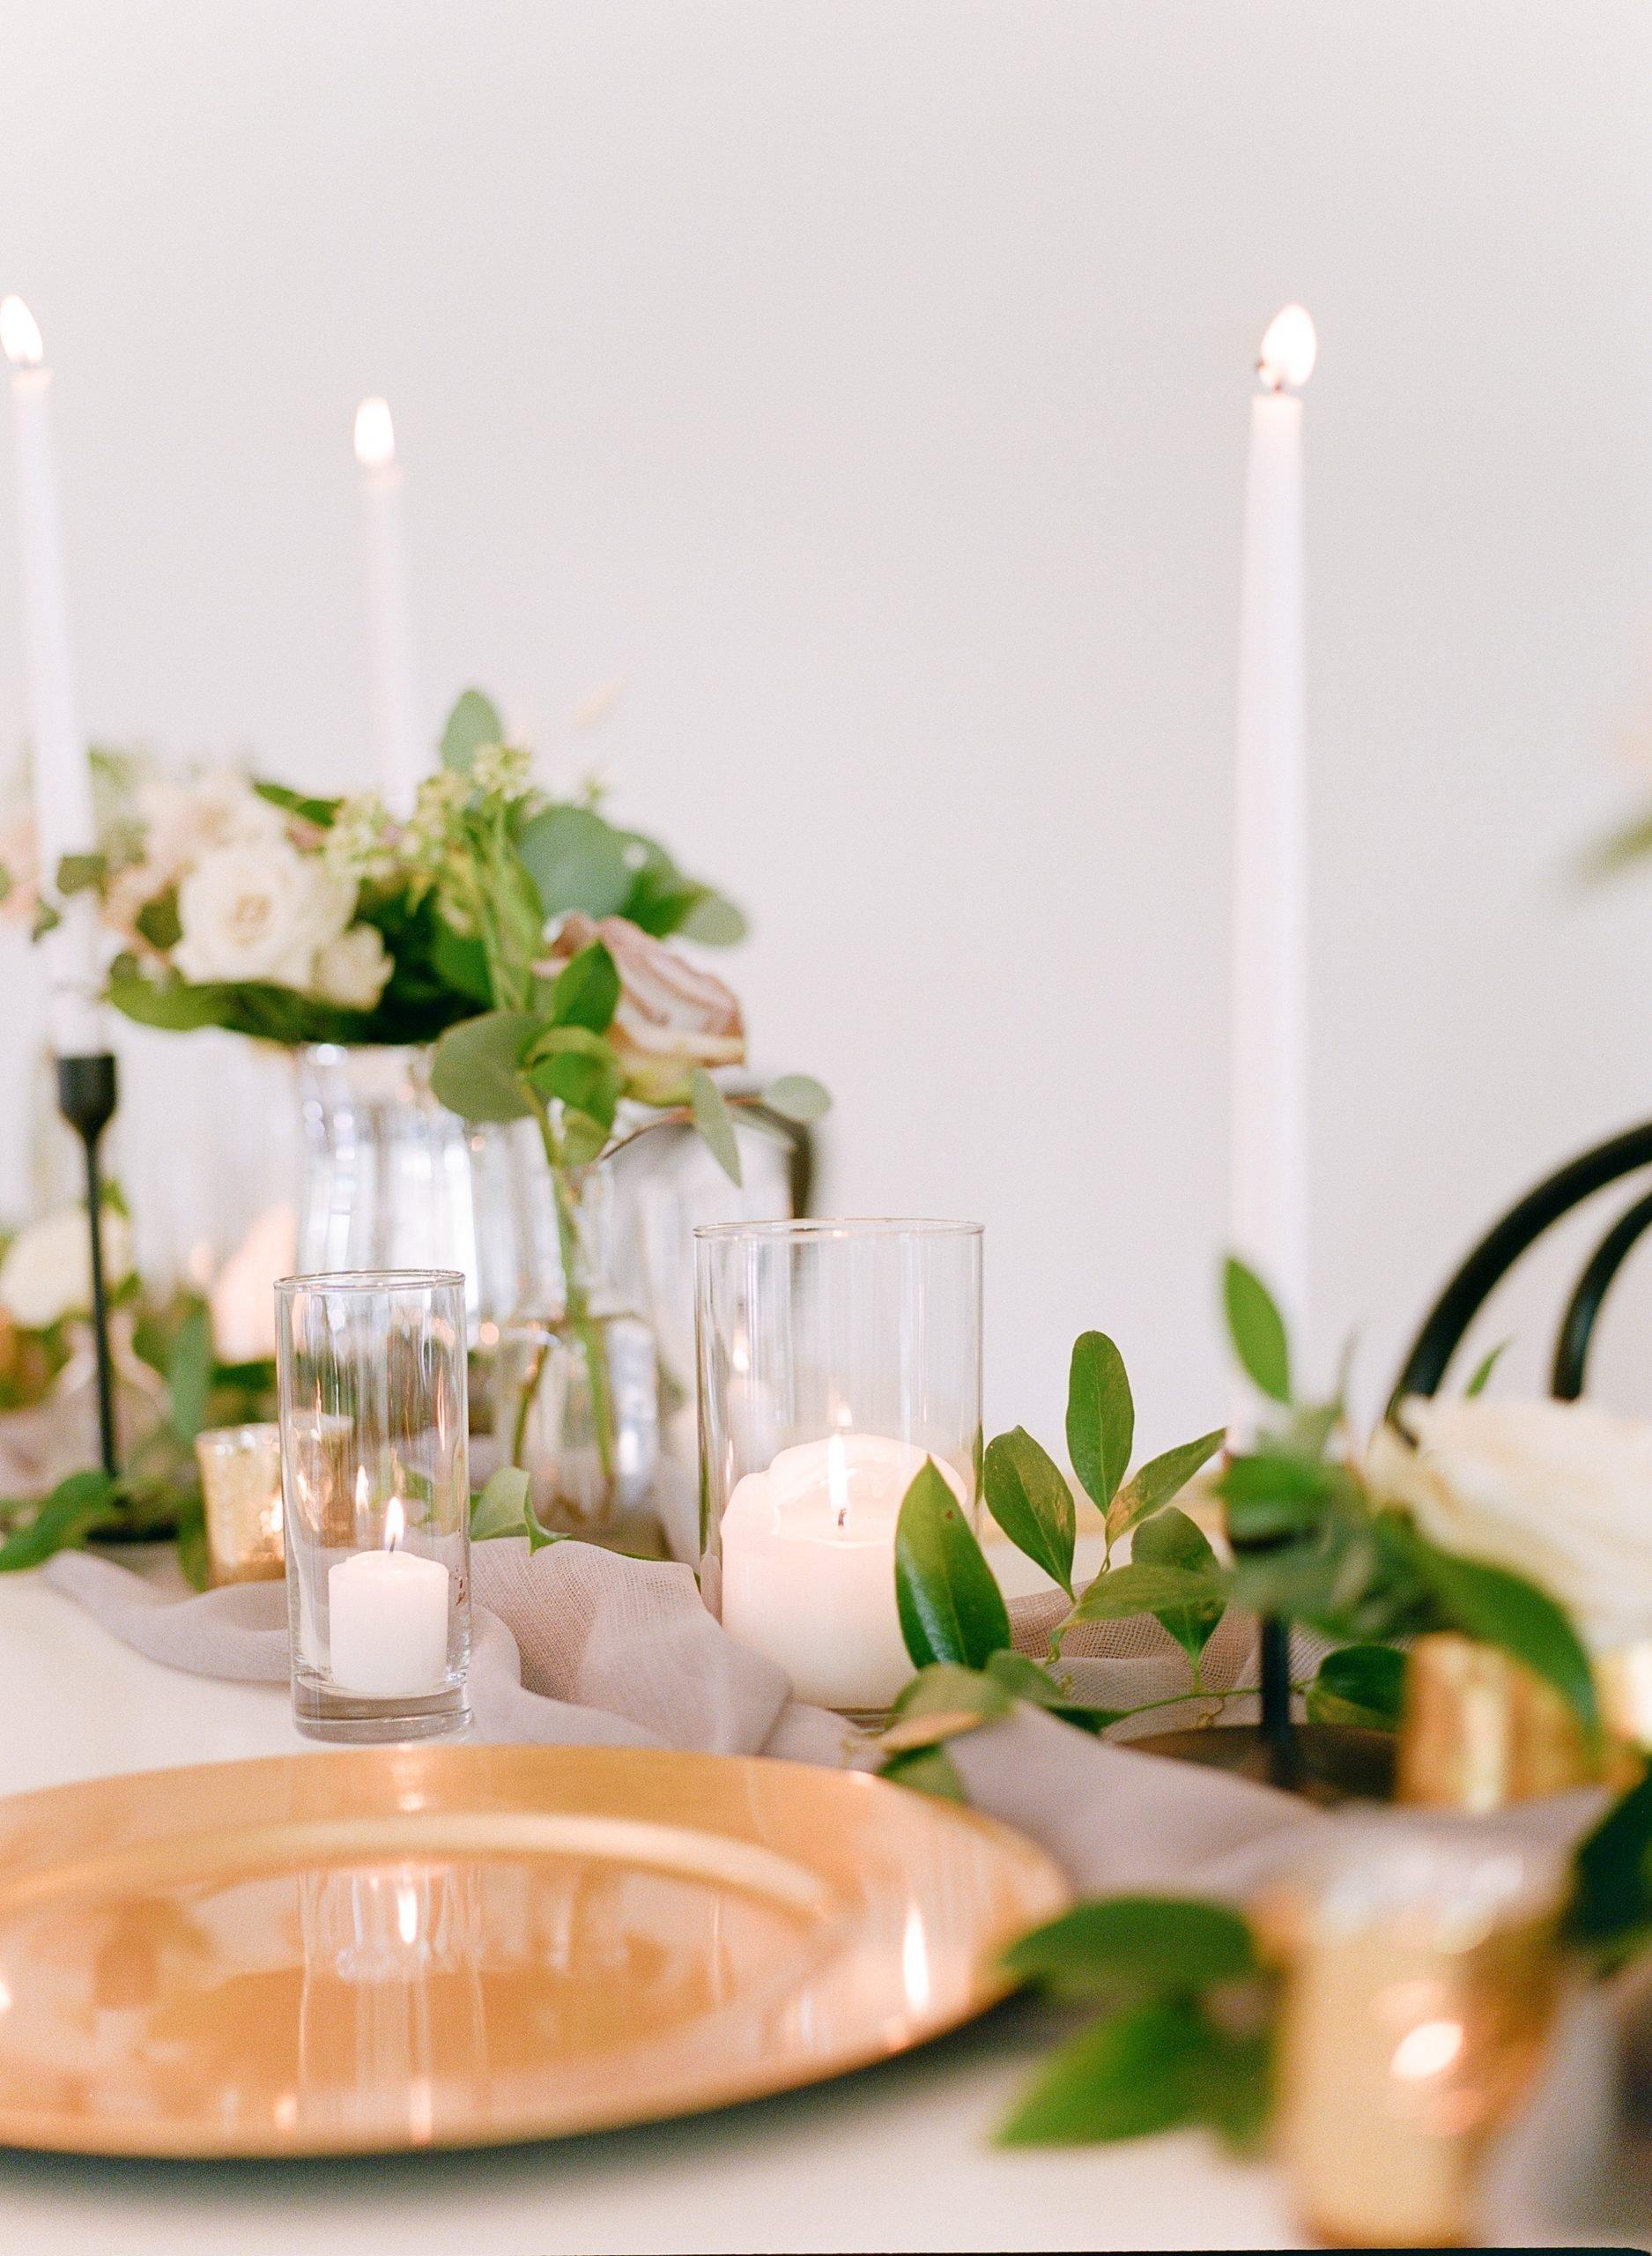 Ben Q Photography - Gold Table Setting with Greenery - Dallas Wedding - Modern Wedding - Wedding Decor - Taper Candles Wedding Tablescape - Dallas, Texas